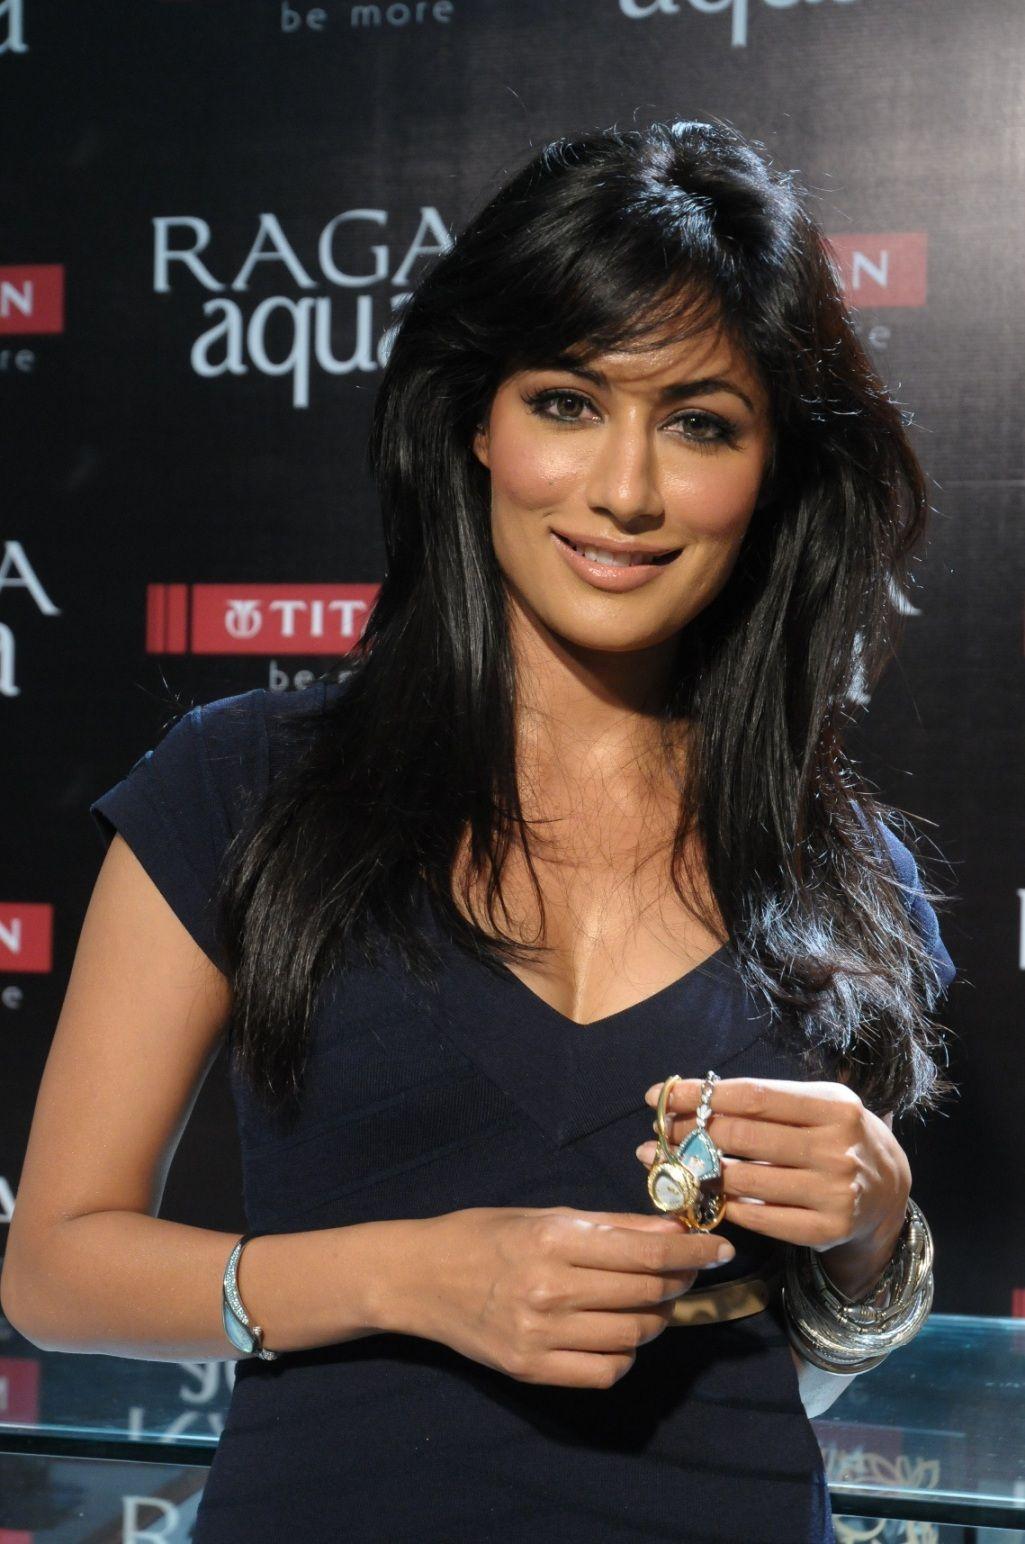 chitrangada singh | pretty women | pinterest | chitrangada singh